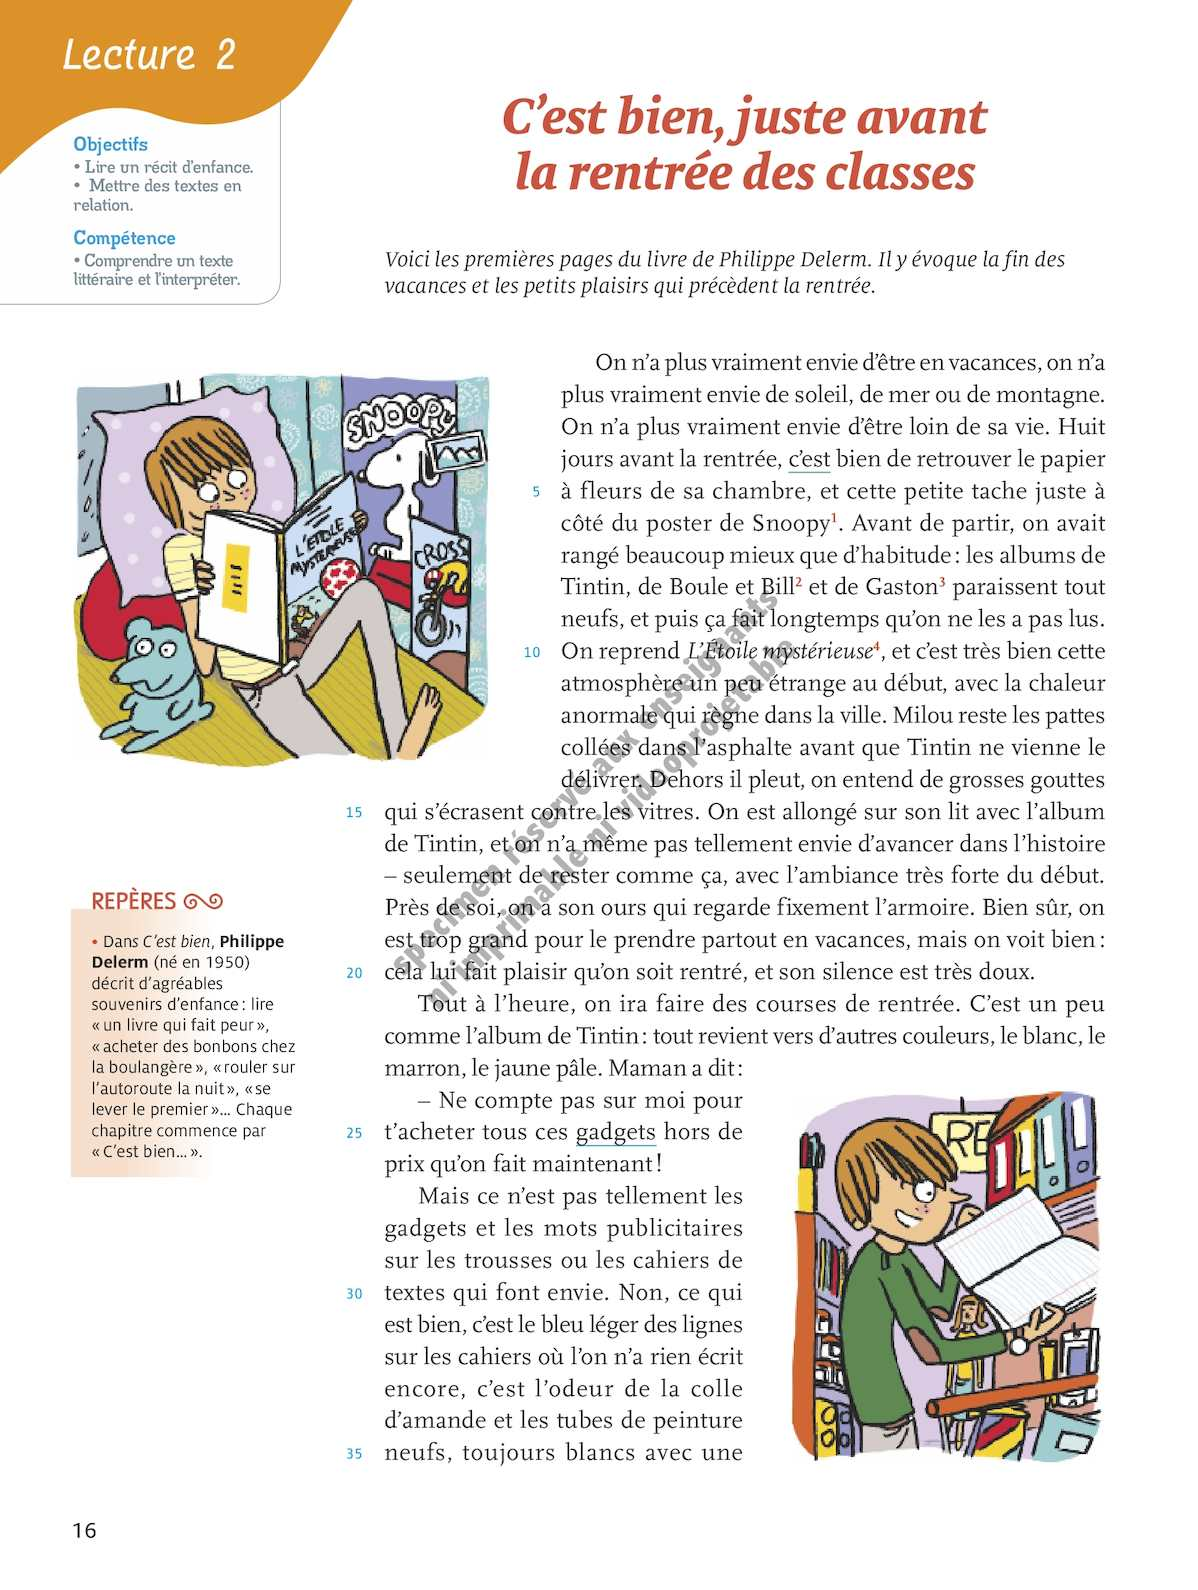 A Retenu Ulysse Bien Avant Belafonte : retenu, ulysse, avant, belafonte, CALAMEO, Downloader